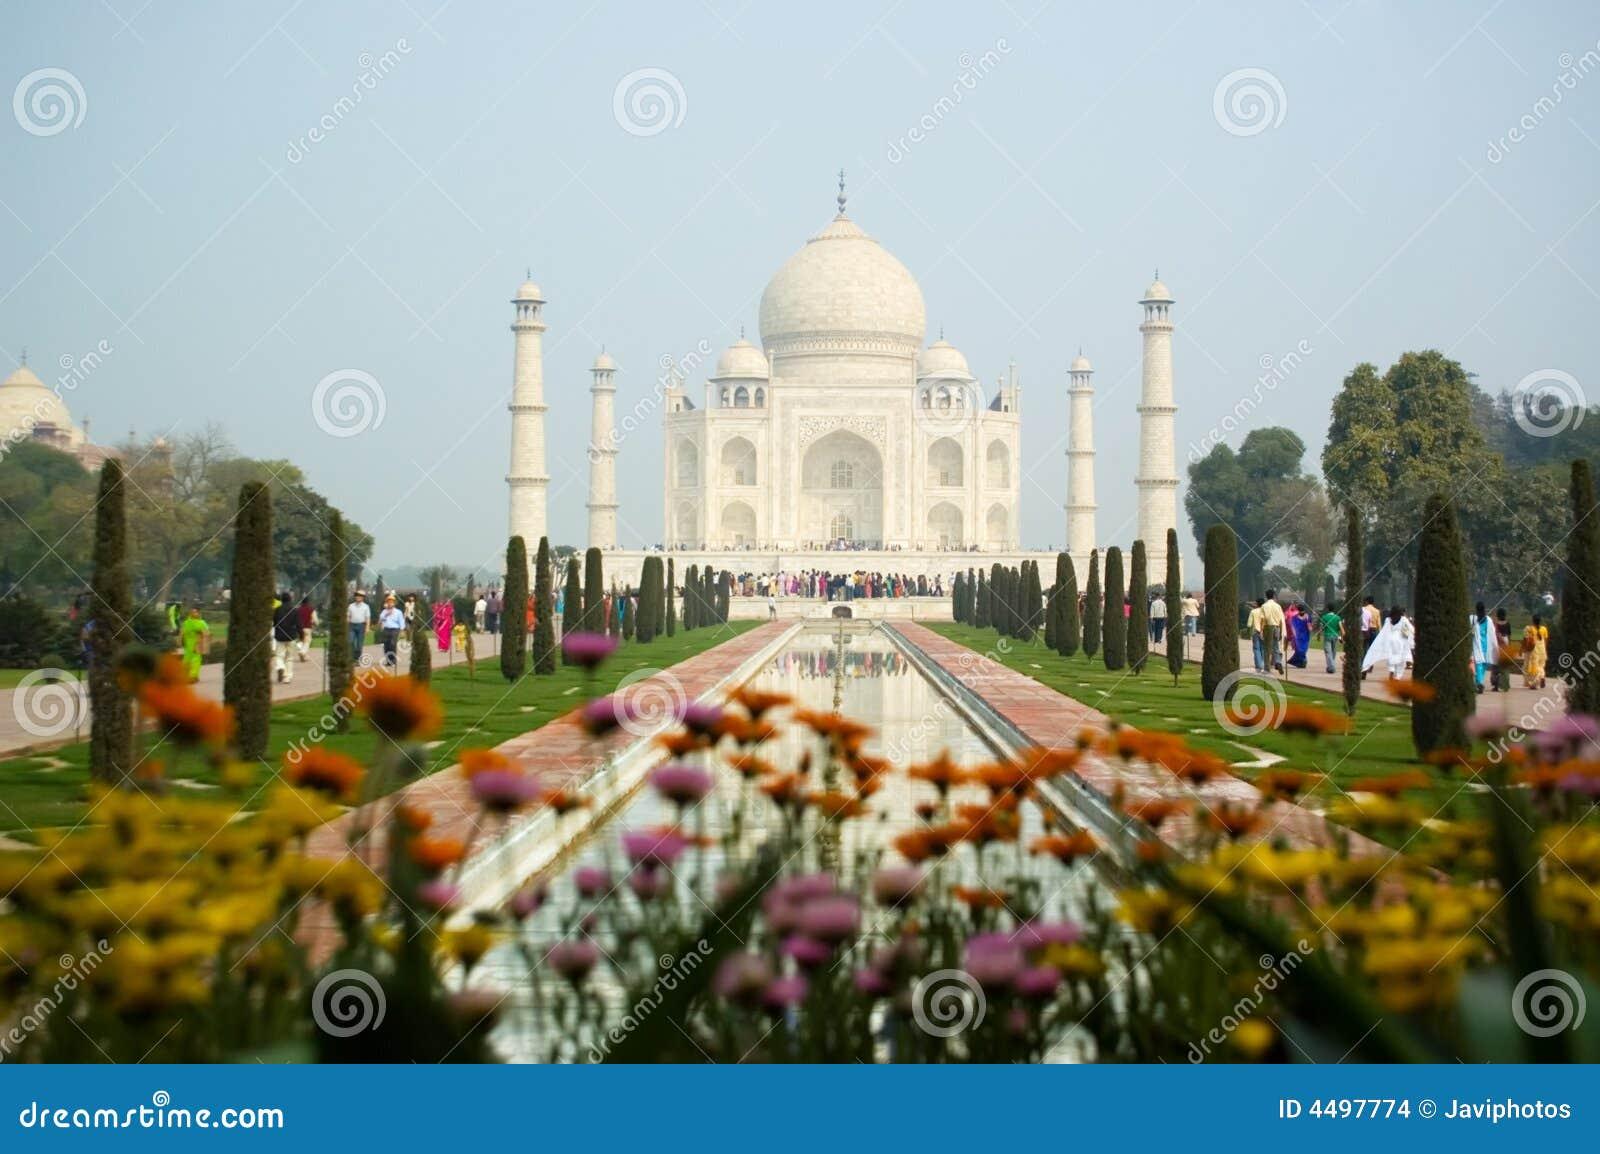 Taj Mahal Pictures Scenic Travel Photos: Taj Mahal Agra India Stock Images